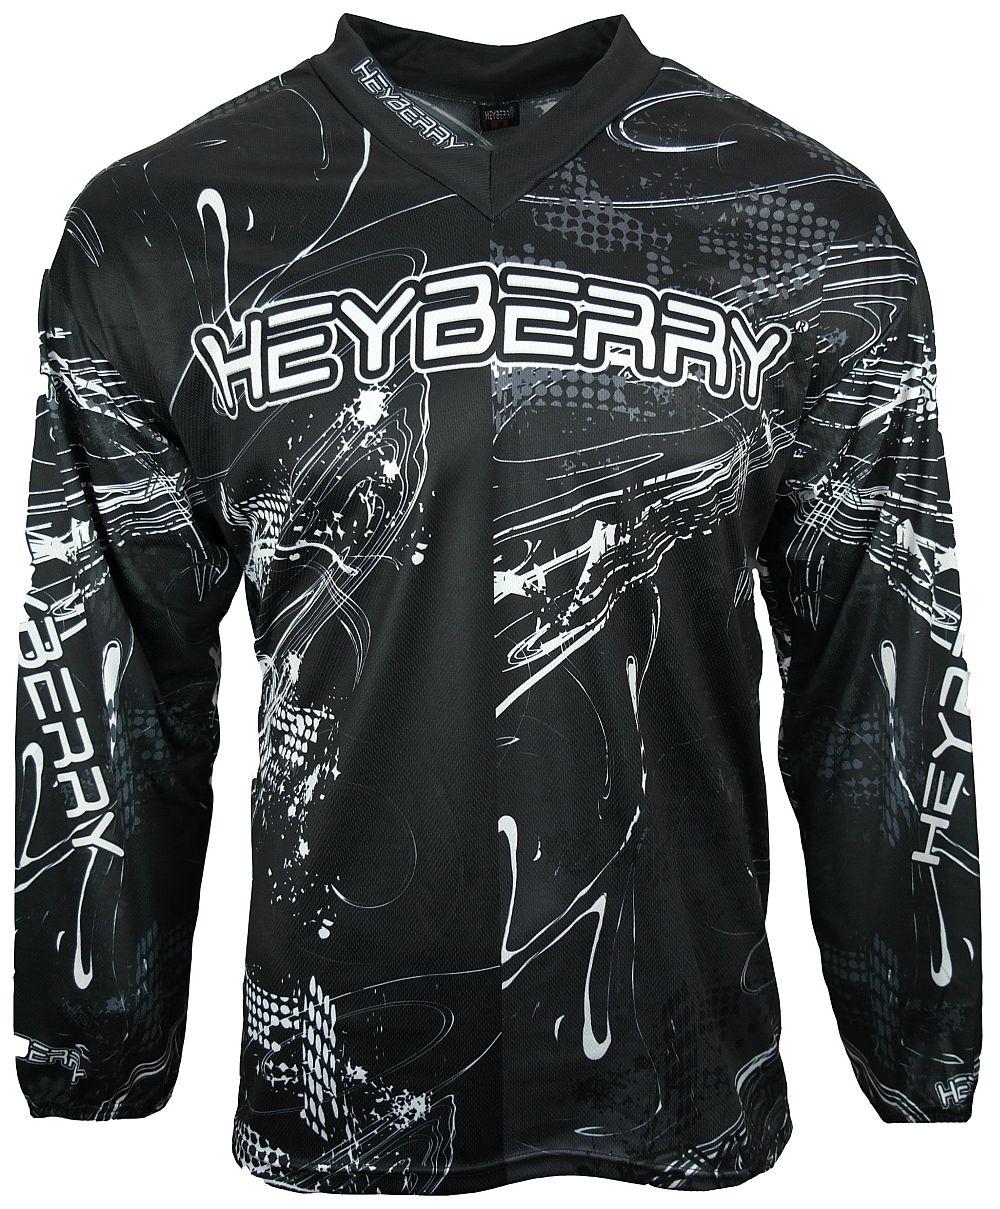 Heyberry Motocross MX Shirt Jersey Trikot schwarz weiß Gr. M - XXL